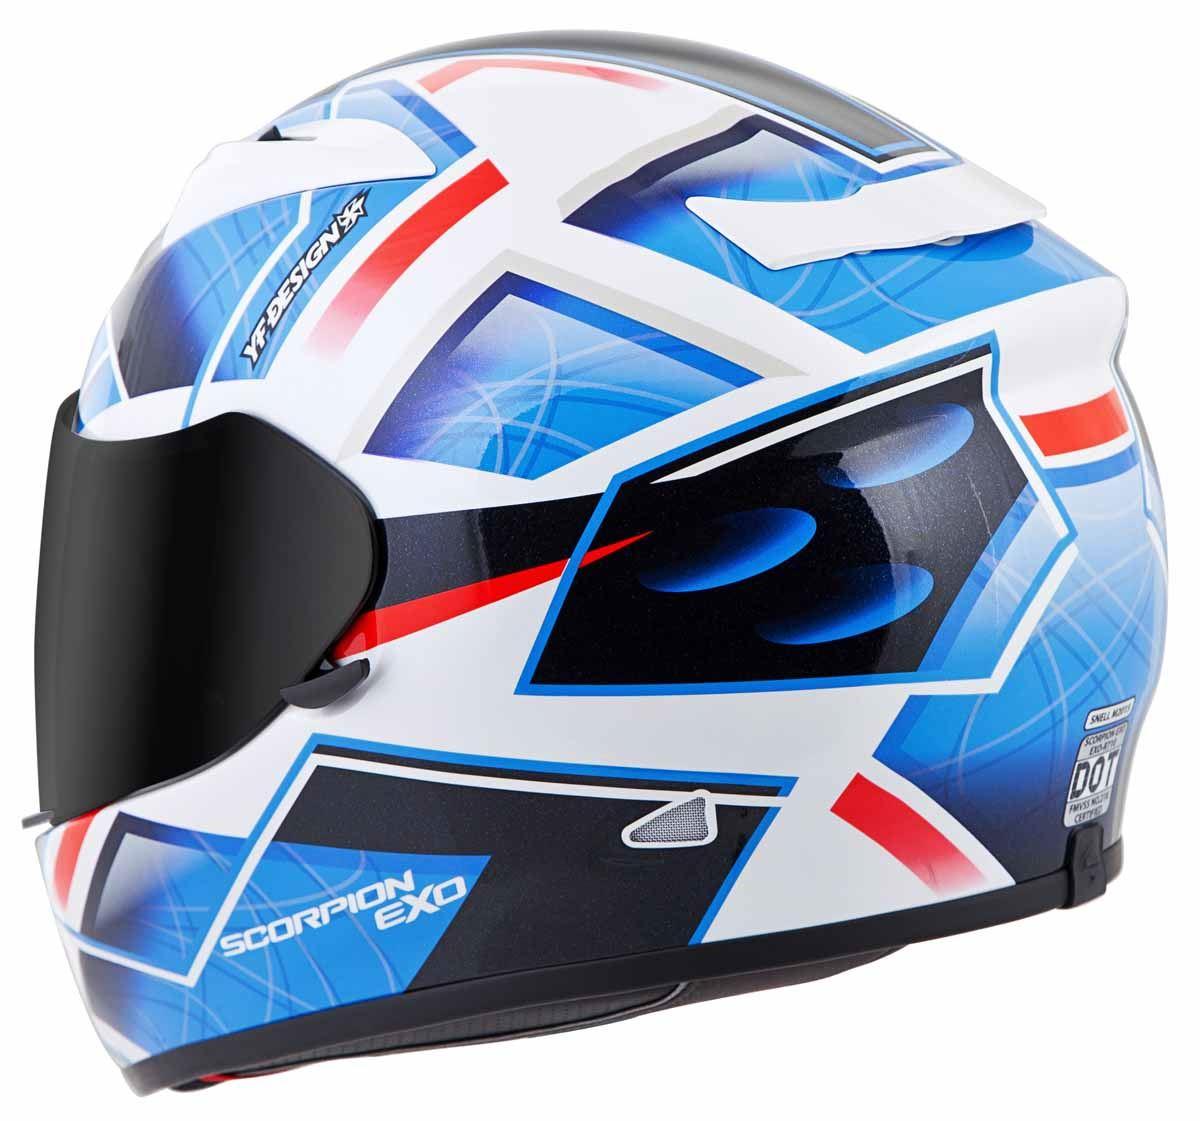 Scorpion-EXO-R710-Helmet-Fiberglass-Full-Face-DOT-SNELL-M2015-Certified-XS-2XL miniature 20